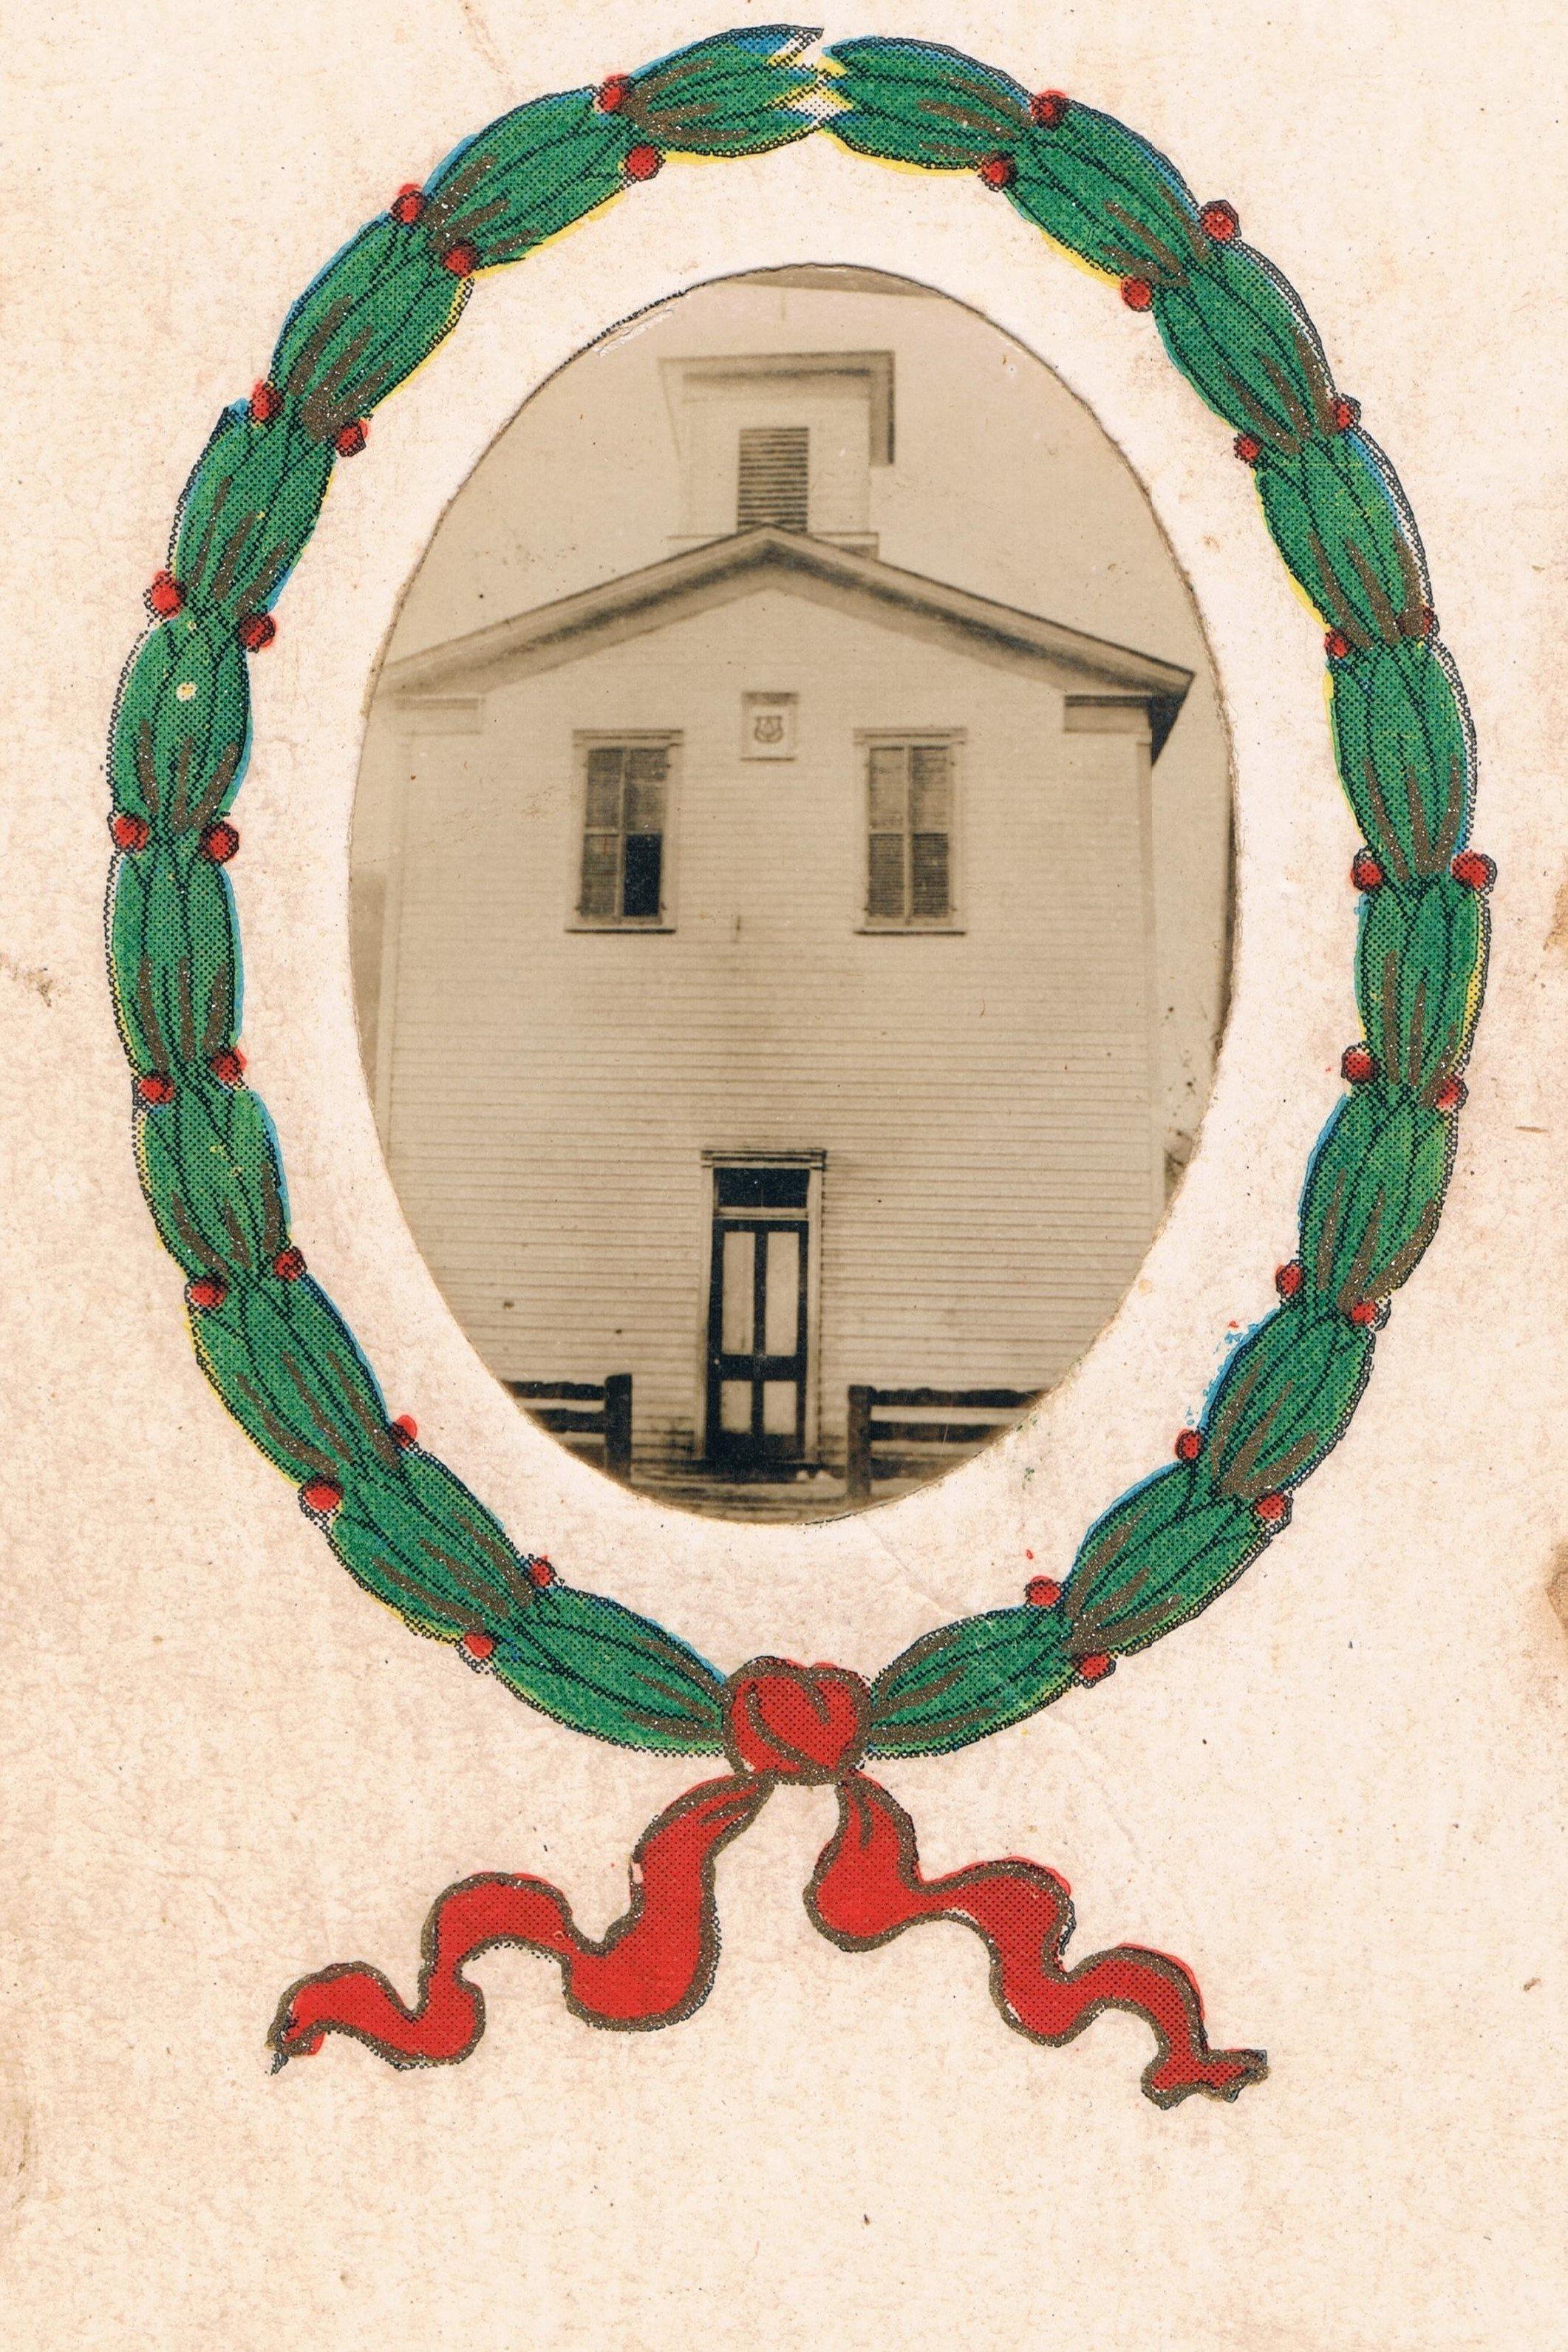 Lodge Hall from a 1909 School Keepsake